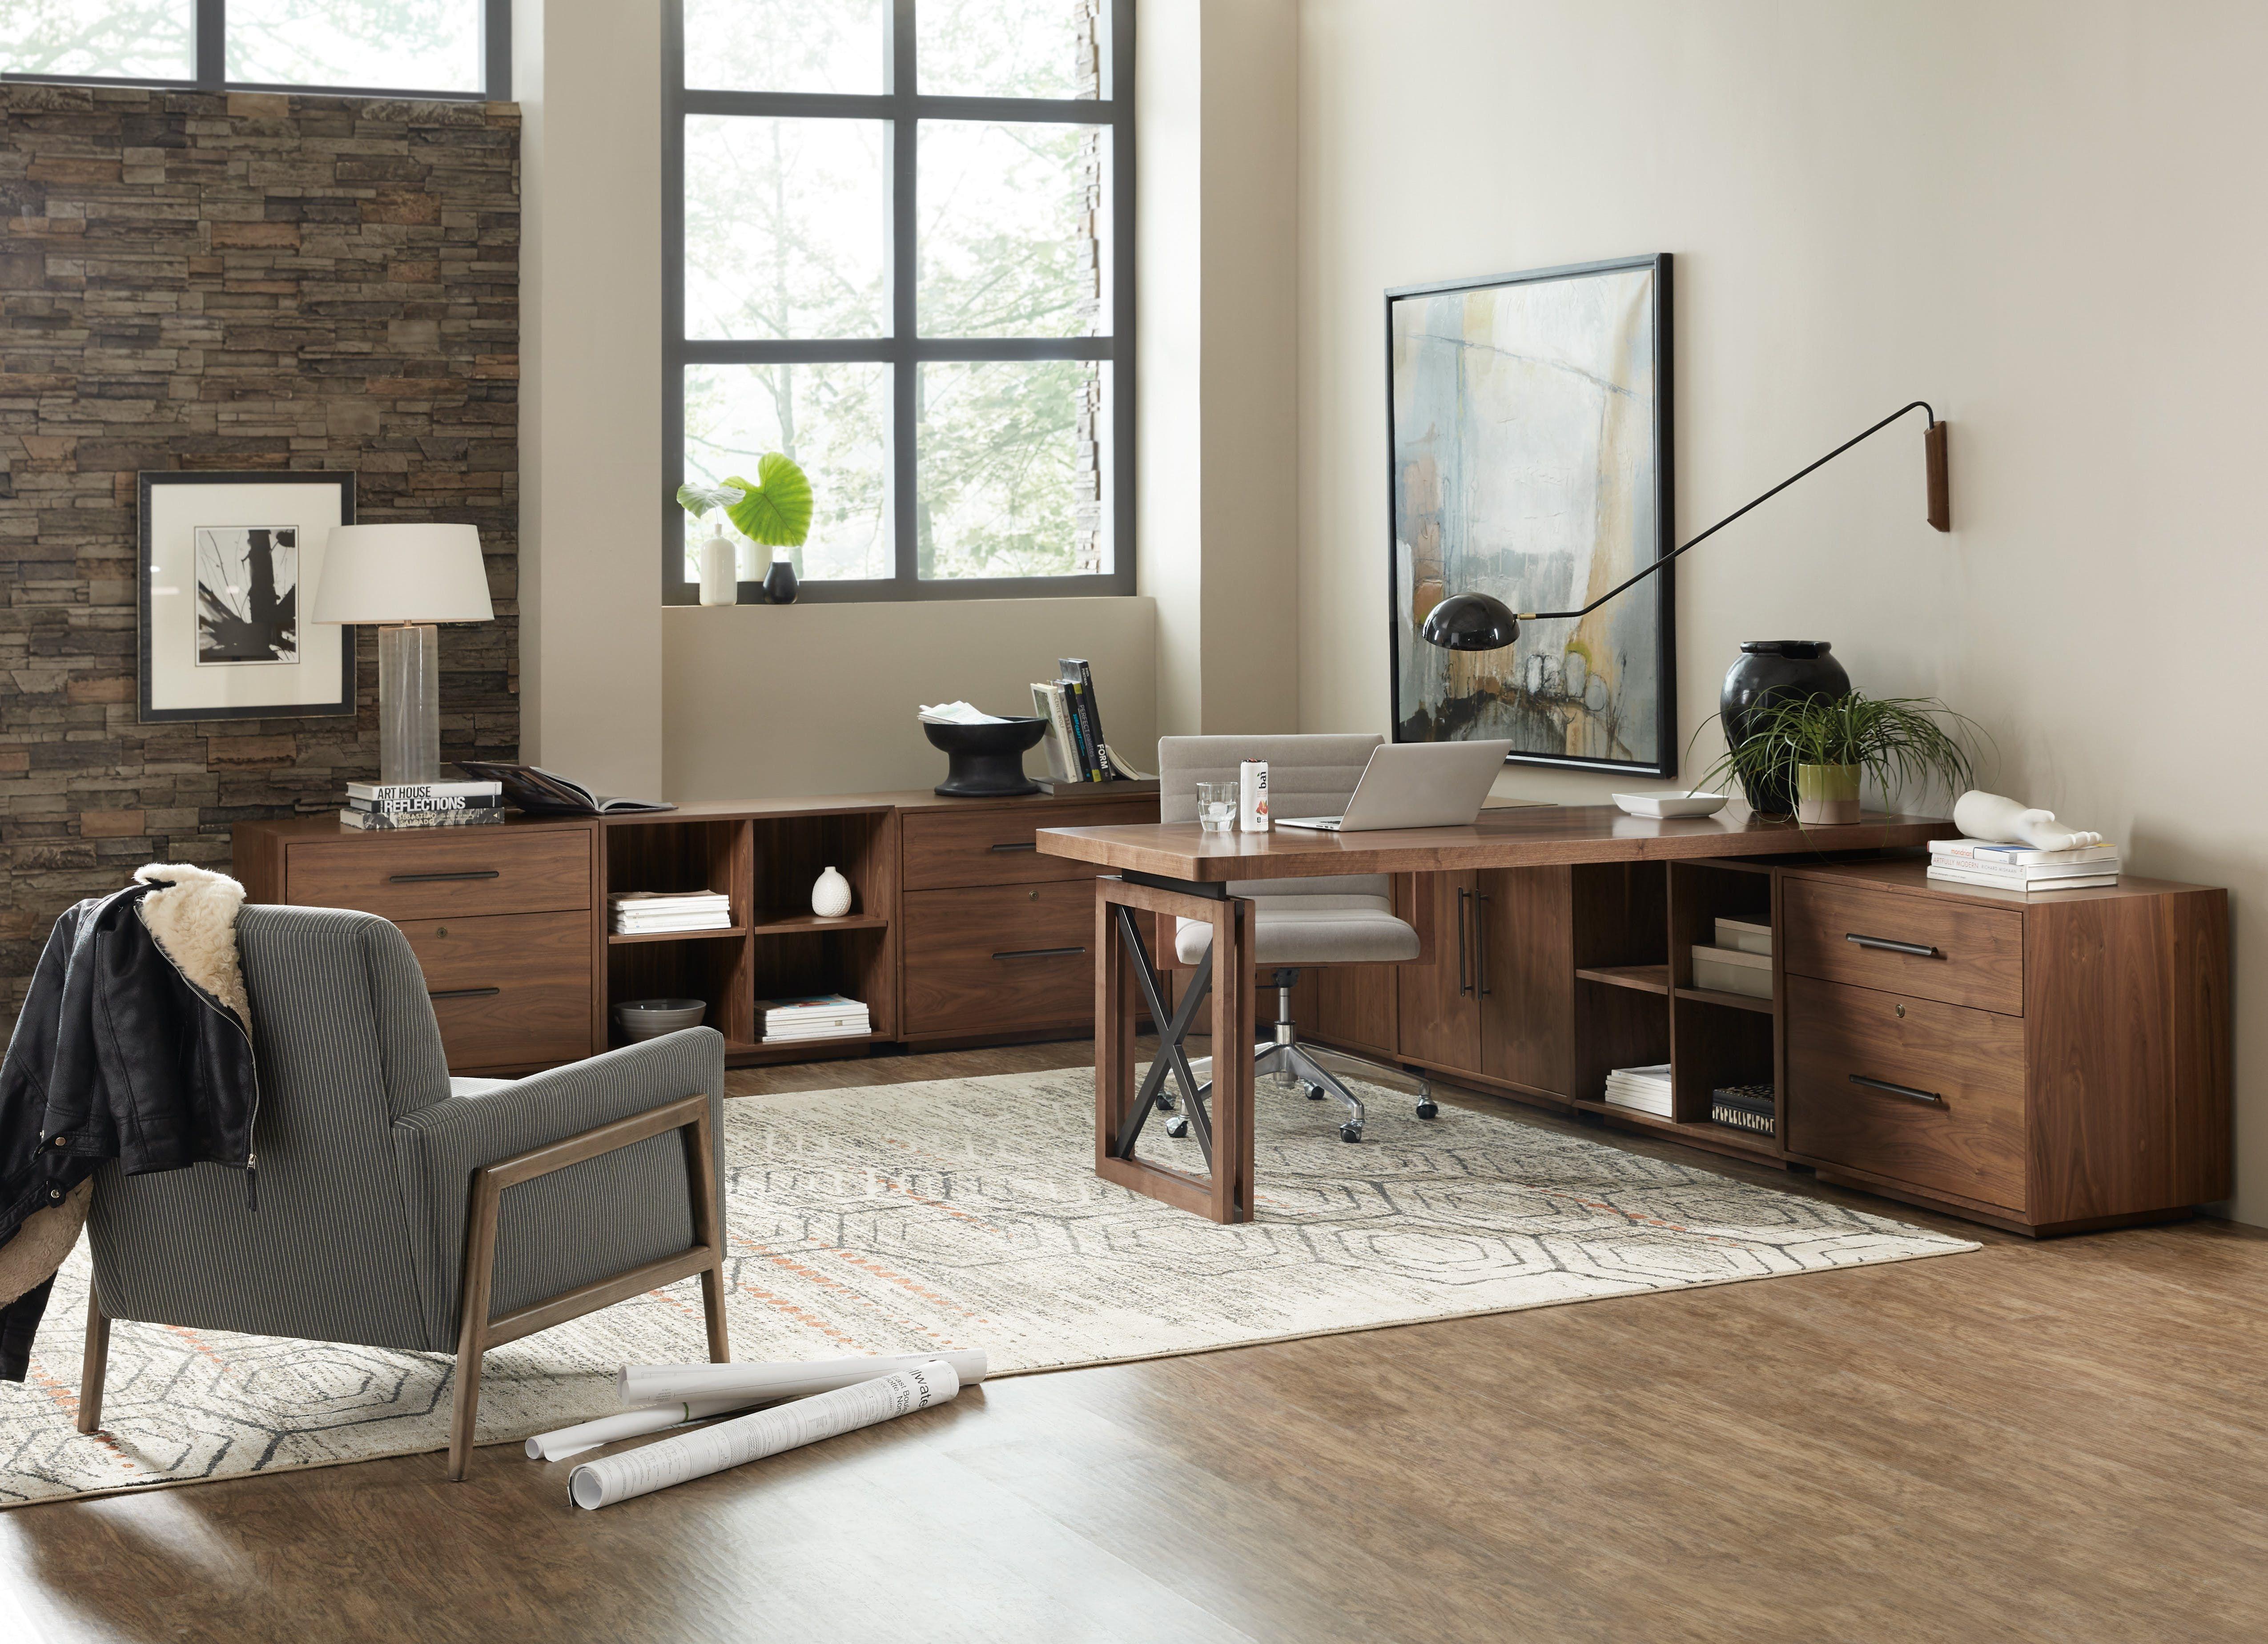 Furniture Fle